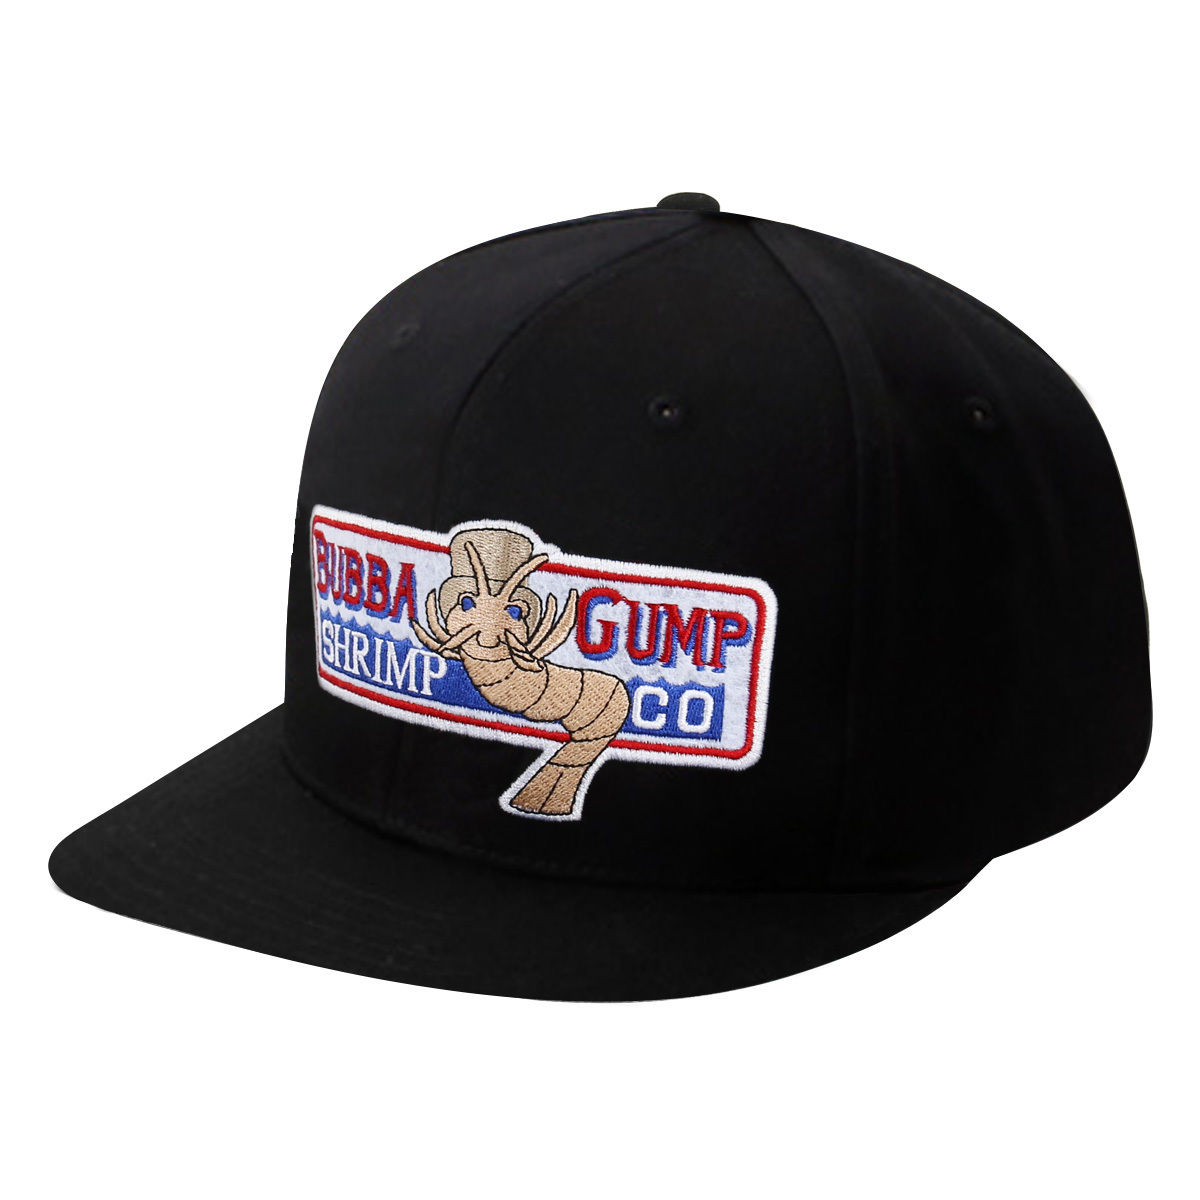 ccd624d8 2019 NEW Bubba Gump Shrimp CO Hat Forrest Gump Costume Embroidered Snapback  Cap